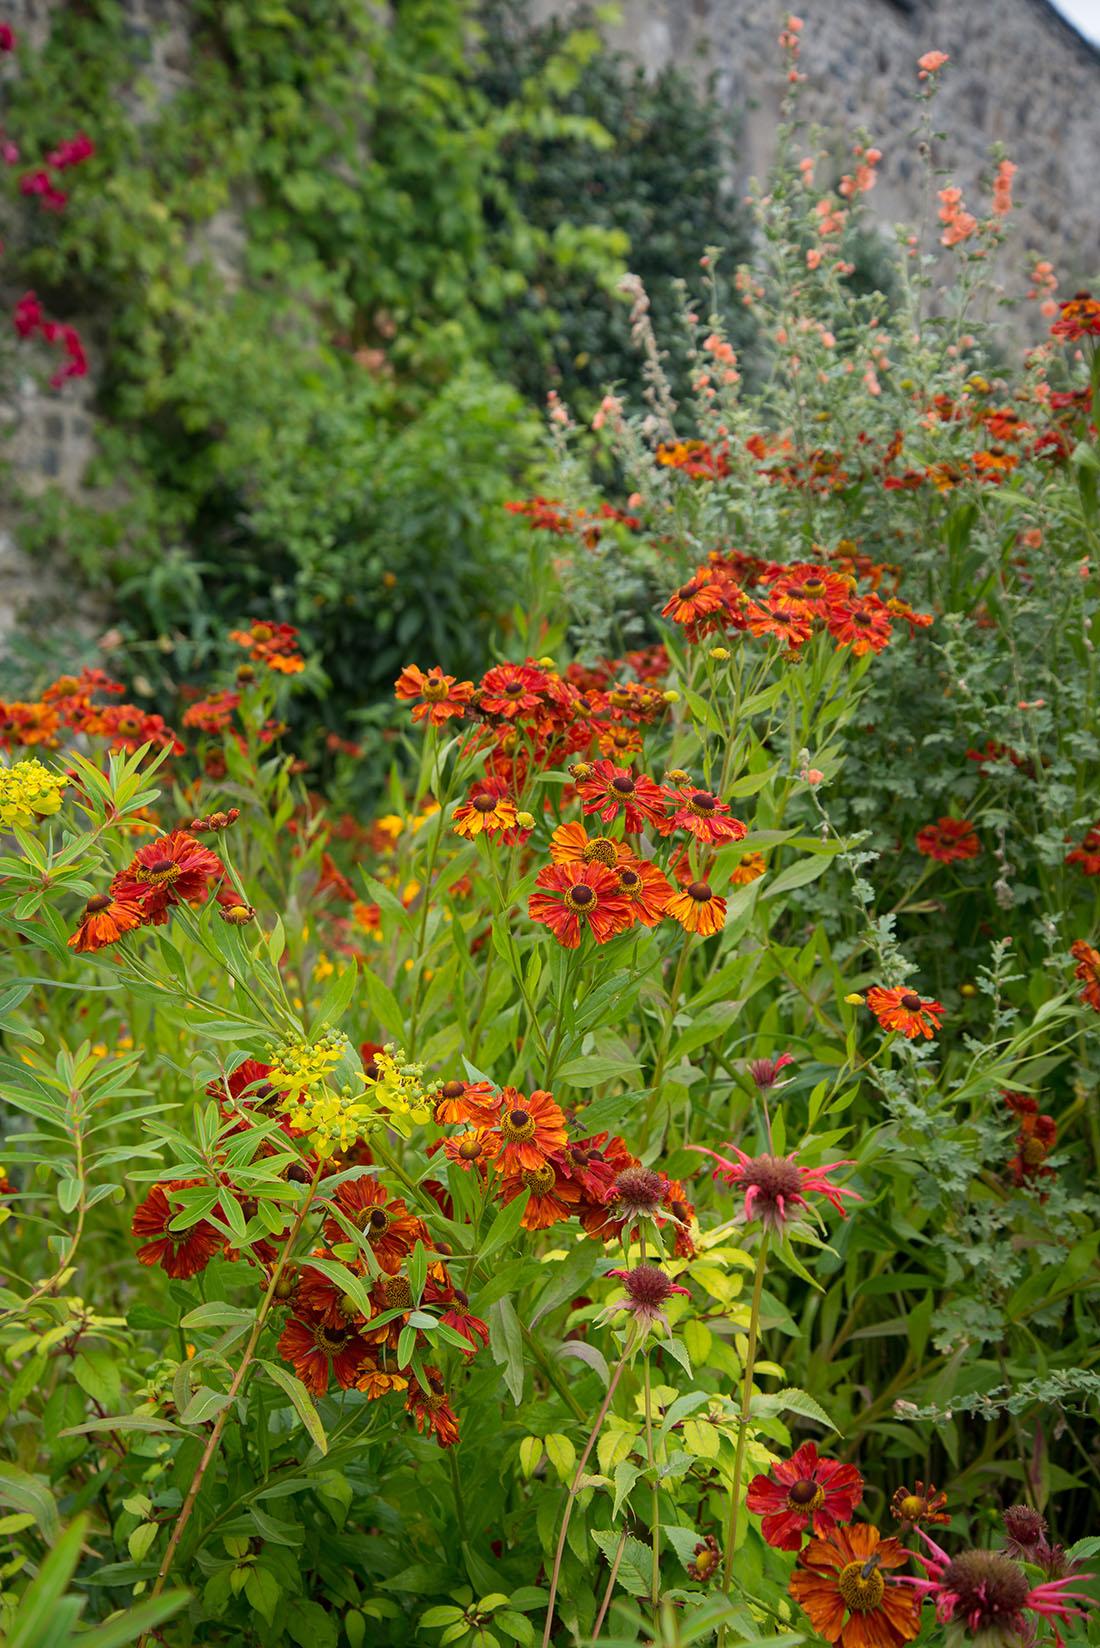 visite des jardins de bodnant gardens,, pays de galles, snowdonia